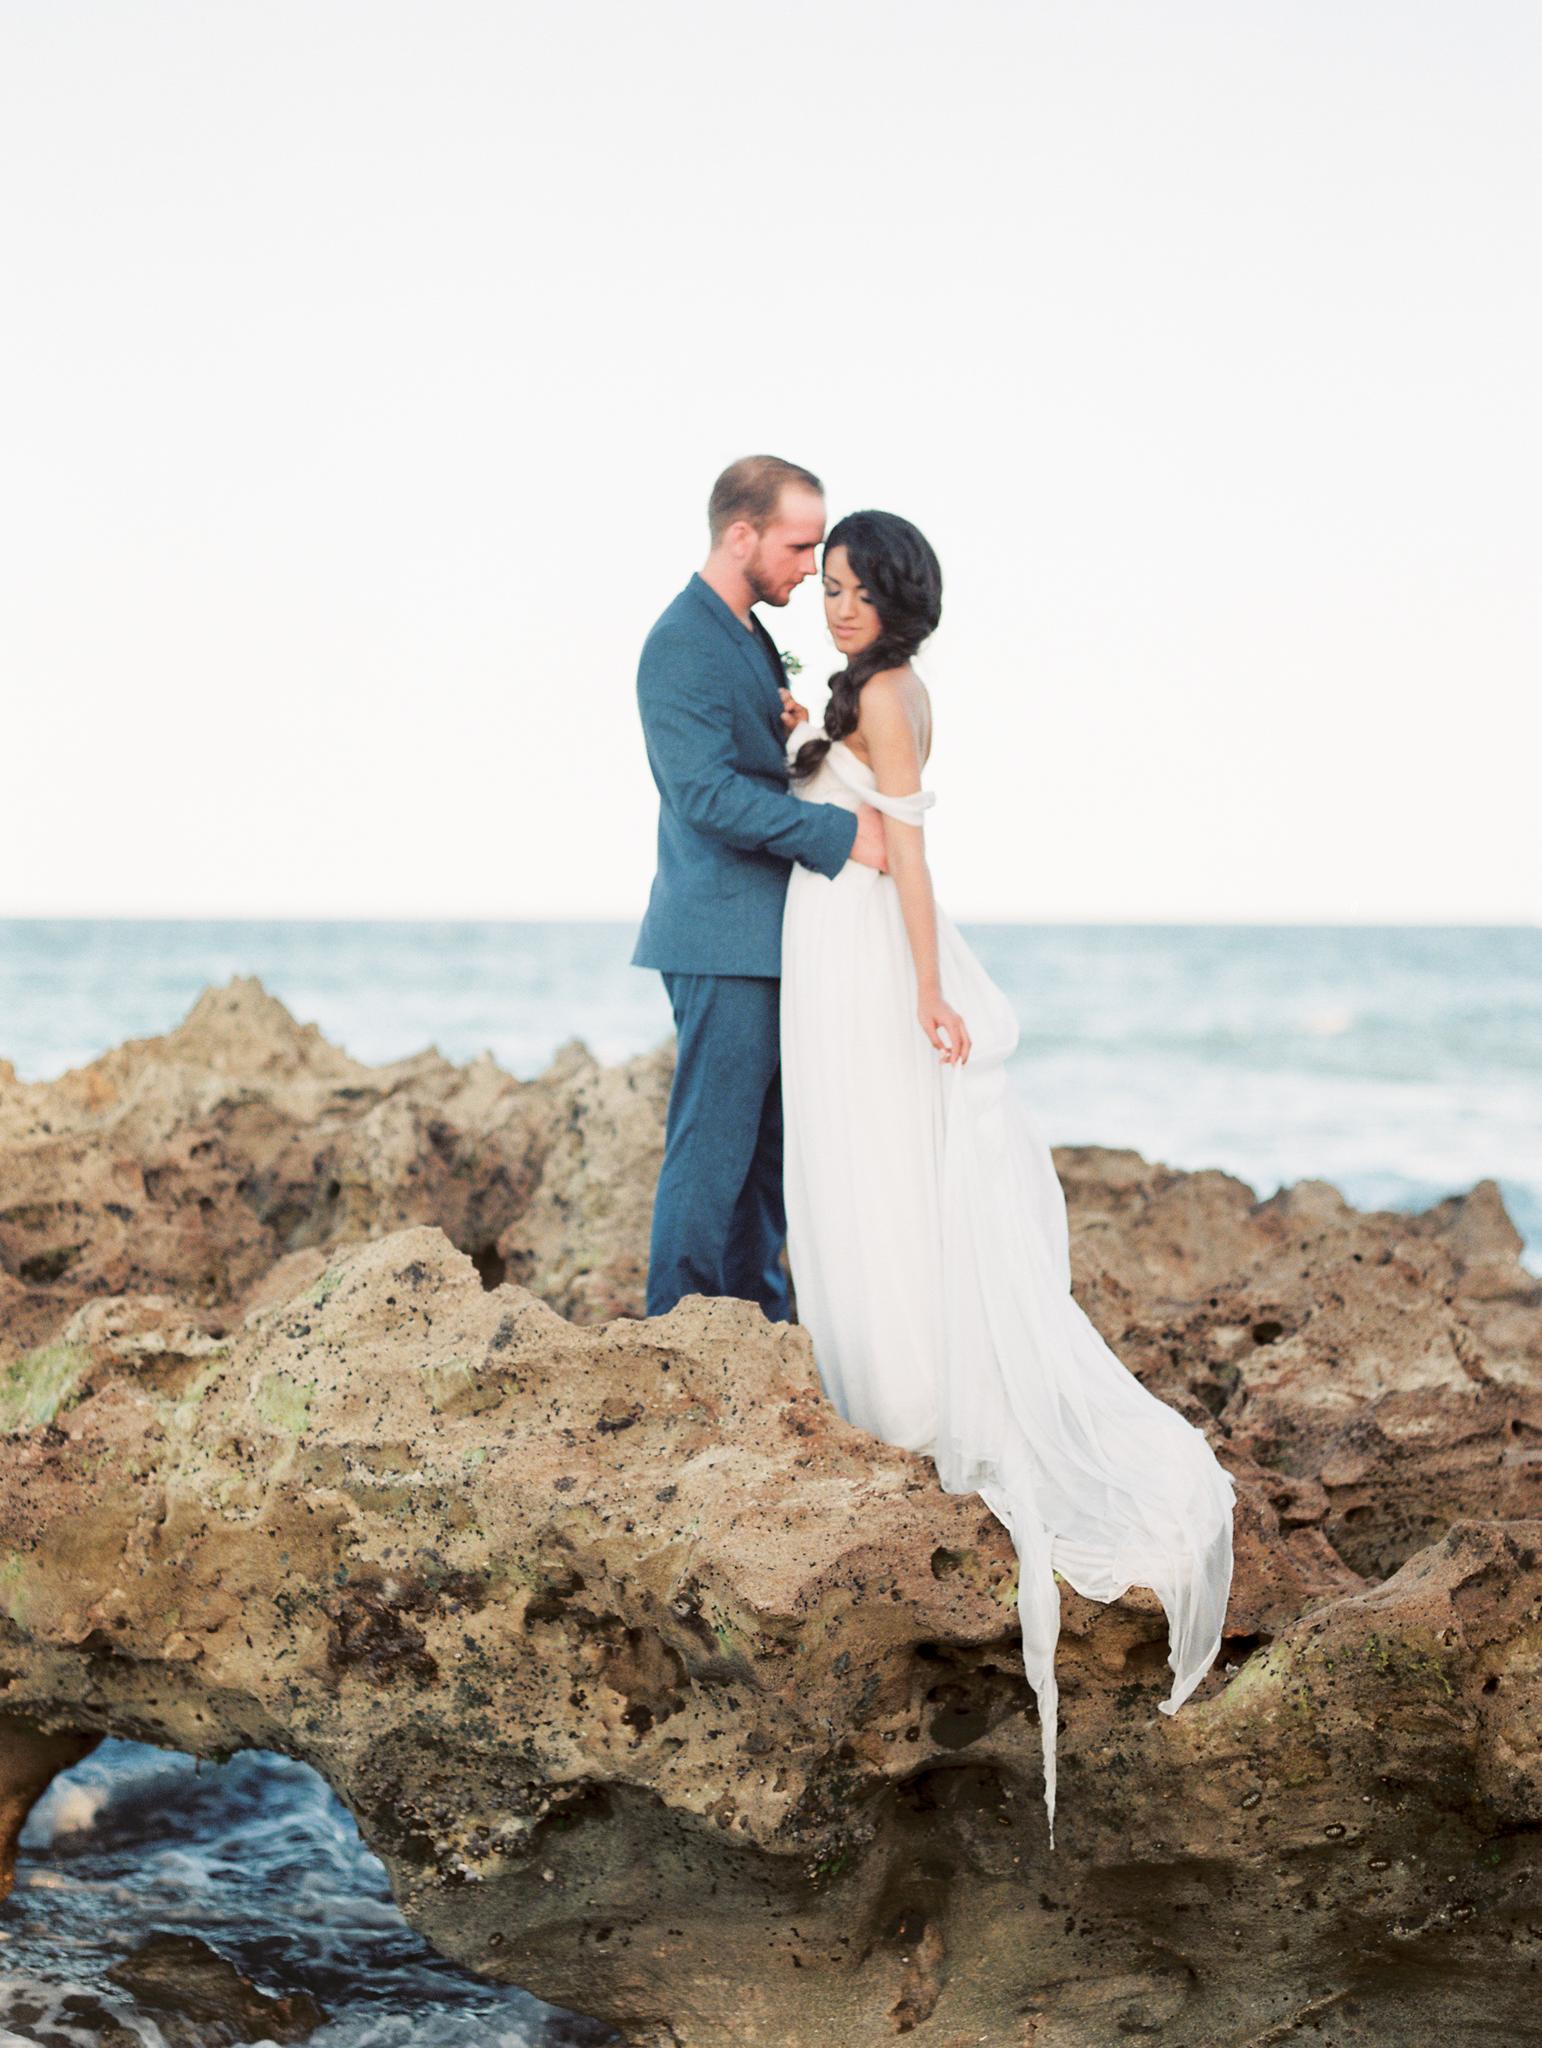 coral cove, jupiter beach FL, palm beach wedding photos, bride and groom on rocks